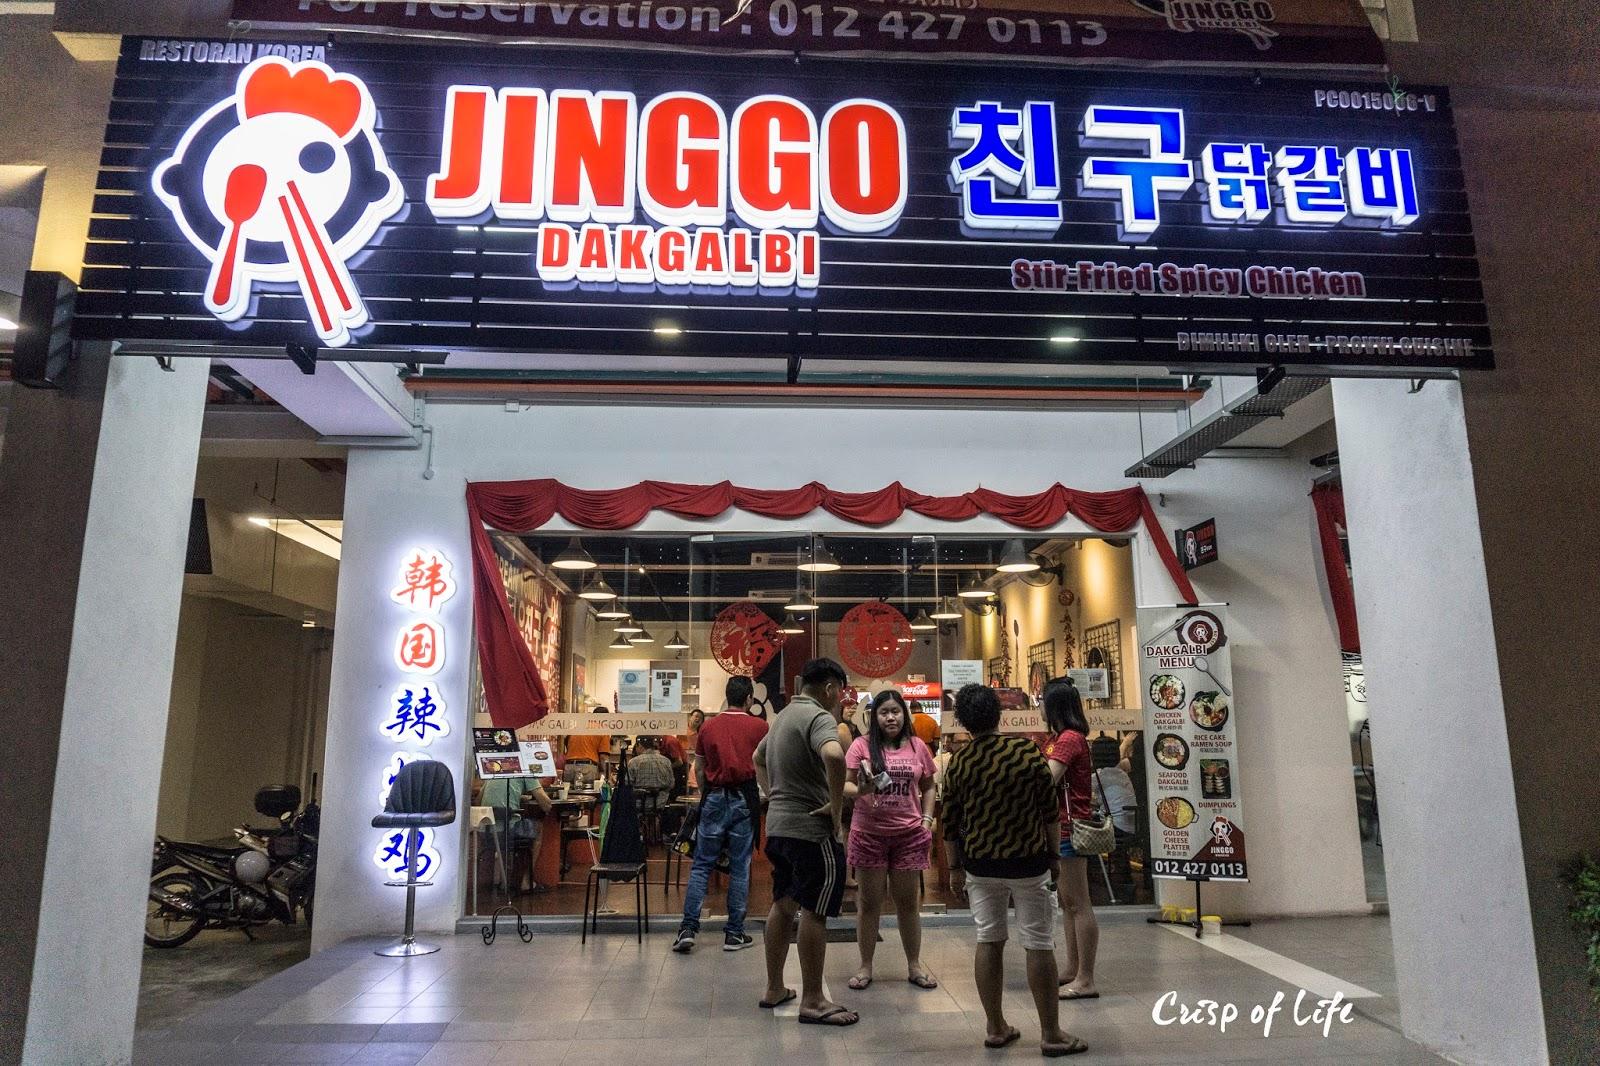 Jinggo Dakgalbi @ Elit Avenue, Penang